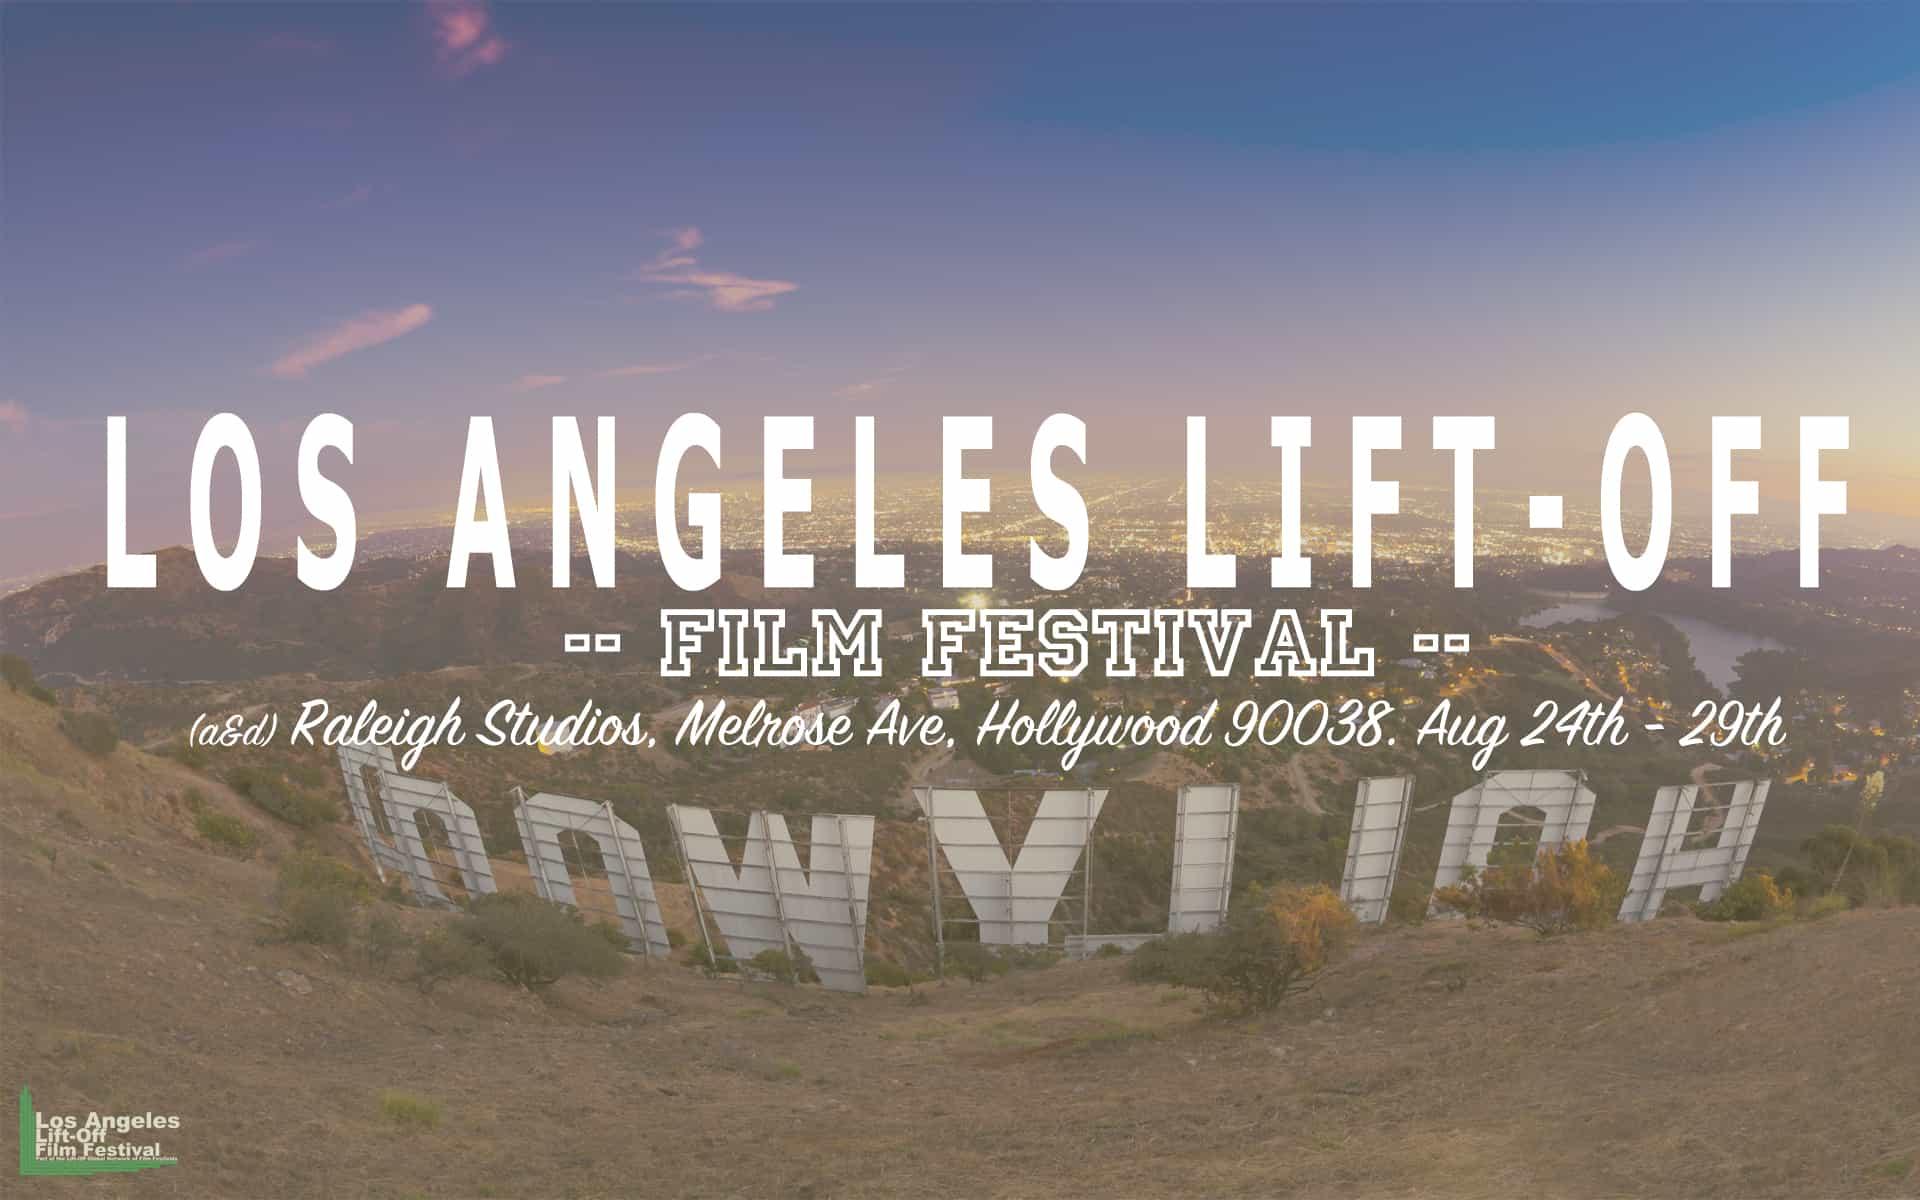 Los Angeles Lift-Off Film Festival 2015 Poster